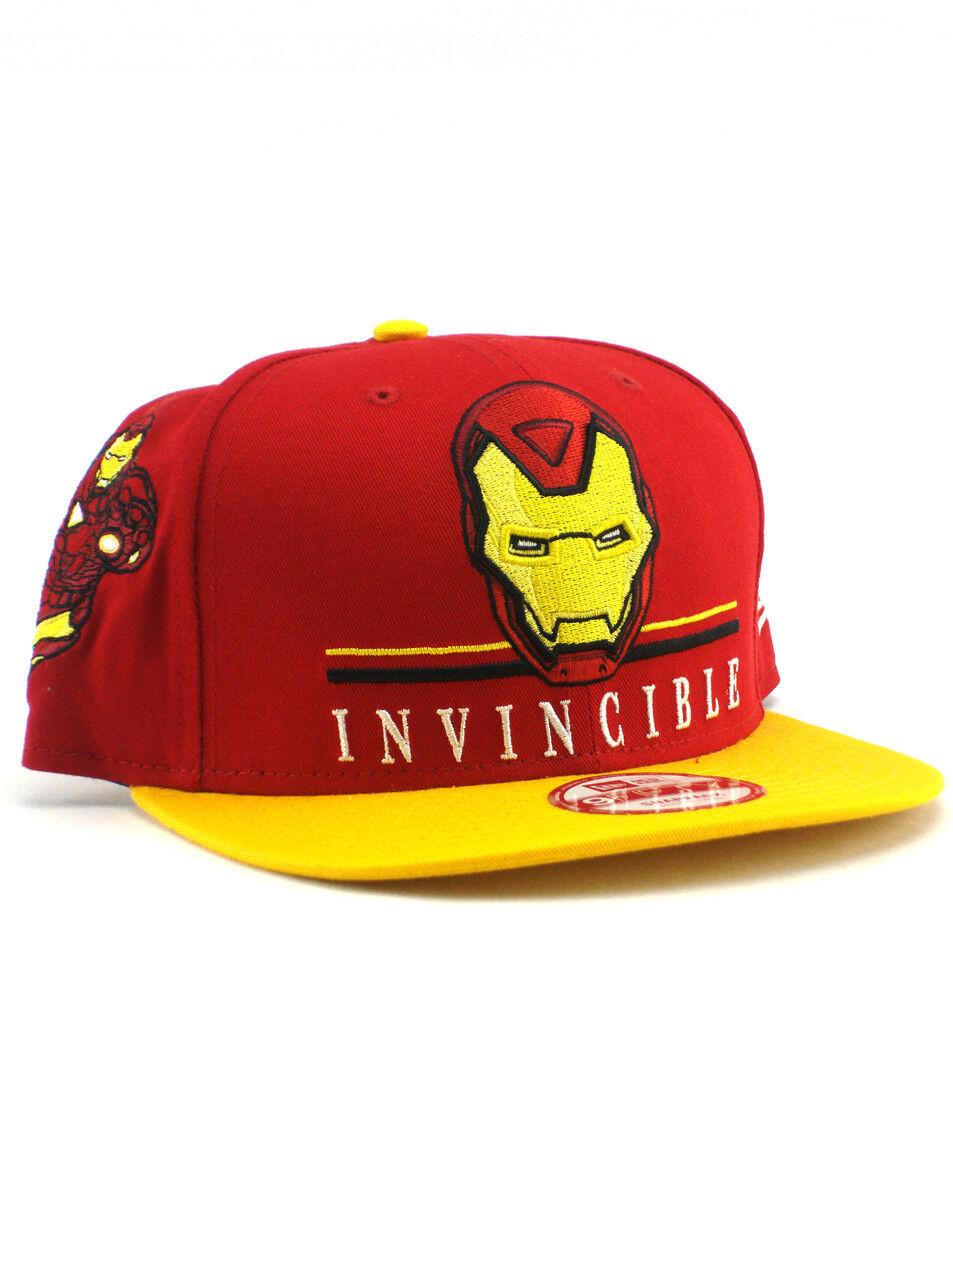 New Era Hat Iron Man 9fifty Snapback Hat Era Invincible Adjustable Marvel Avengers NWT da3114